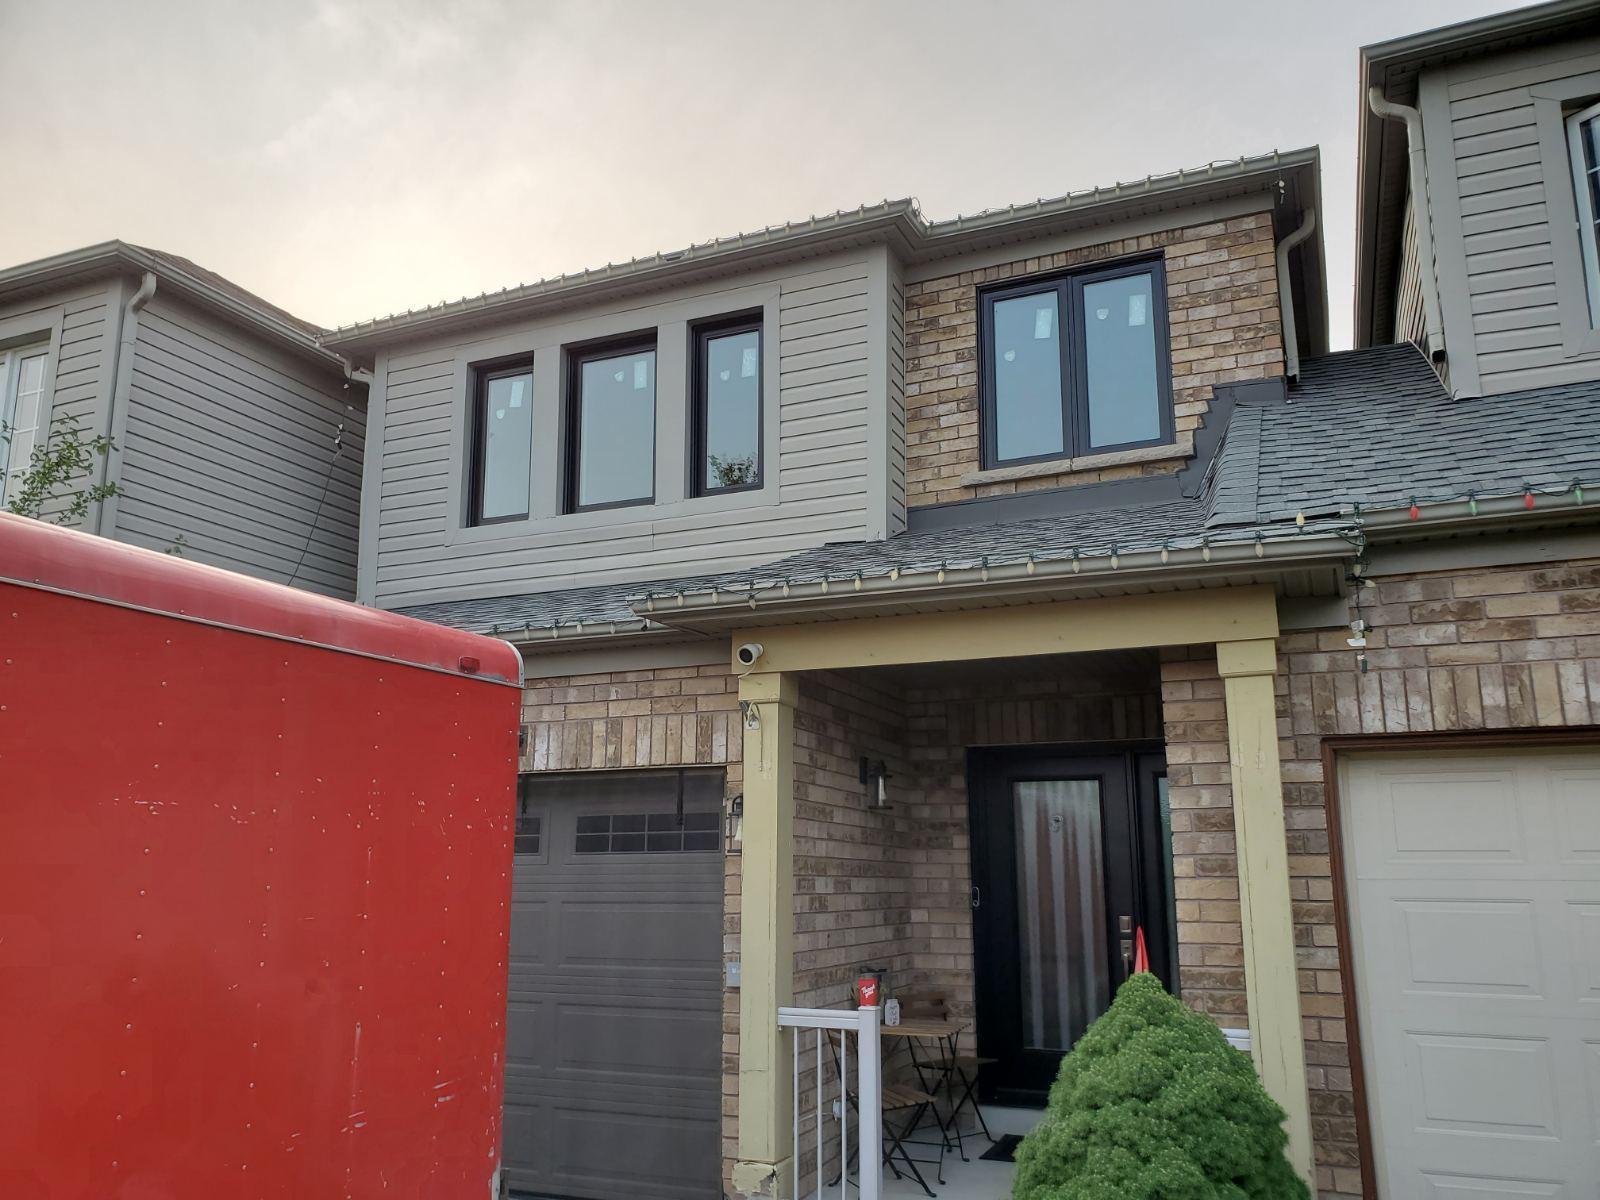 Downtown Toronto Fiberglass and Steel Door Installation and Replacement, PVC Windows Woodbridge, Maple, Vaughan, King, Aurora, Nemwarket, Caledon, Nobleton, Kleinburg